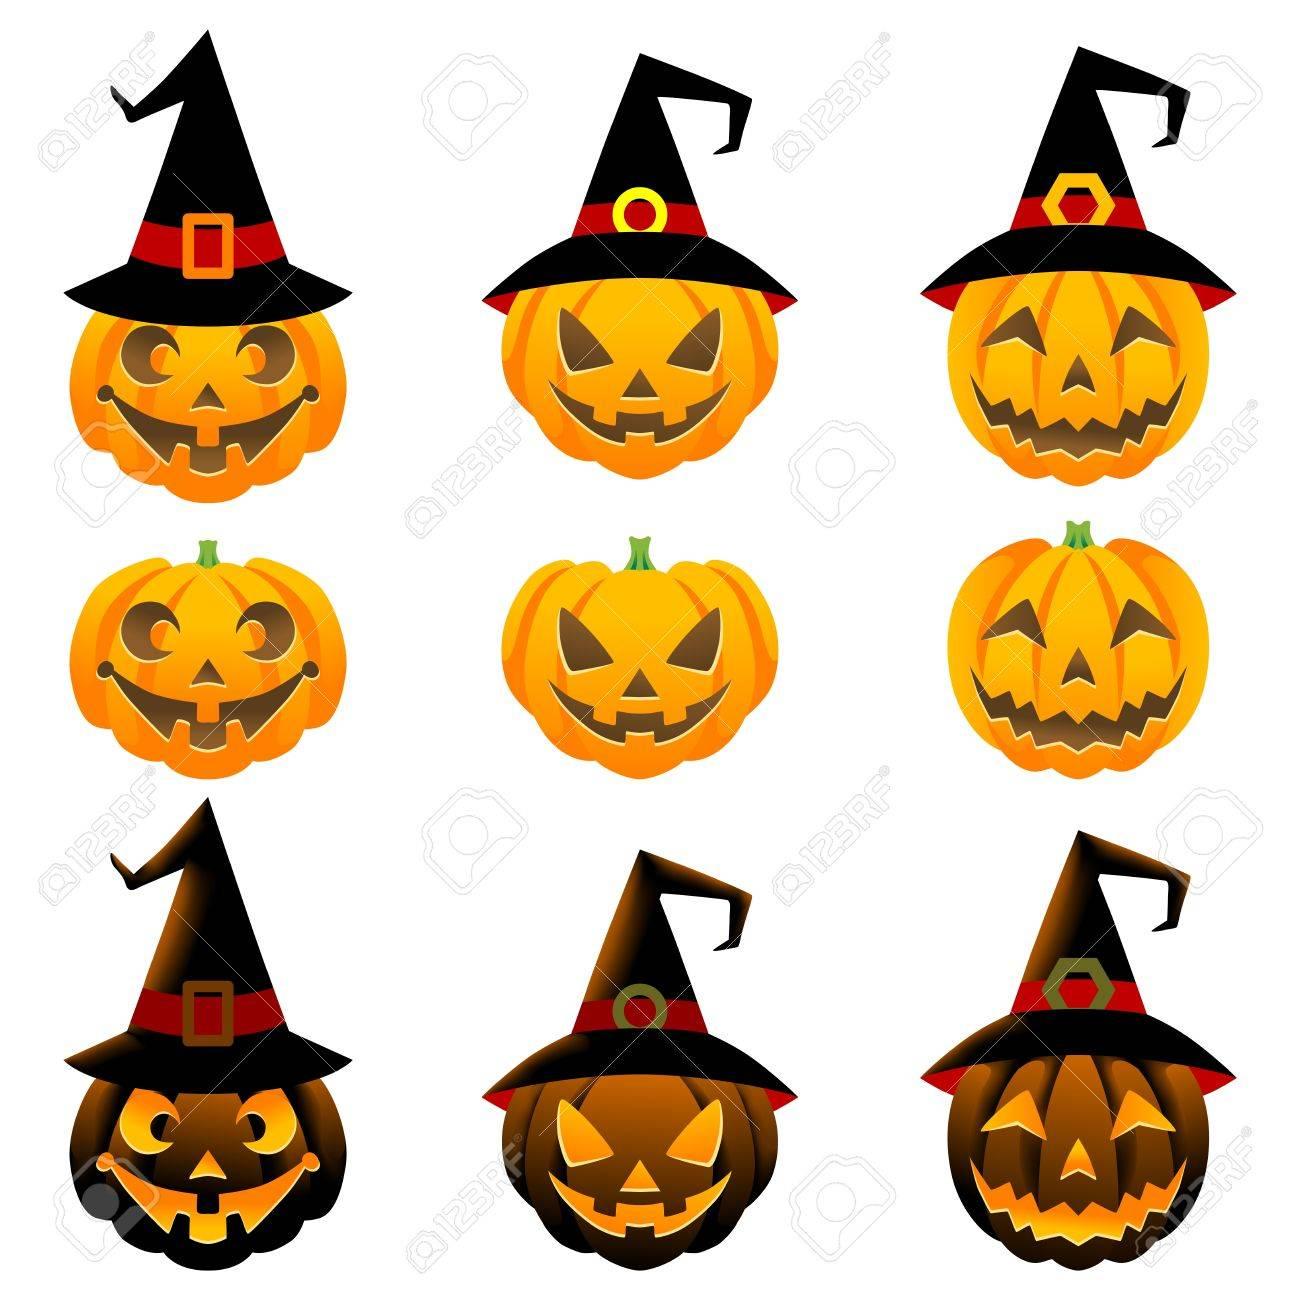 Jack O-lantern set,halloween ornament Stock Vector - 15250408